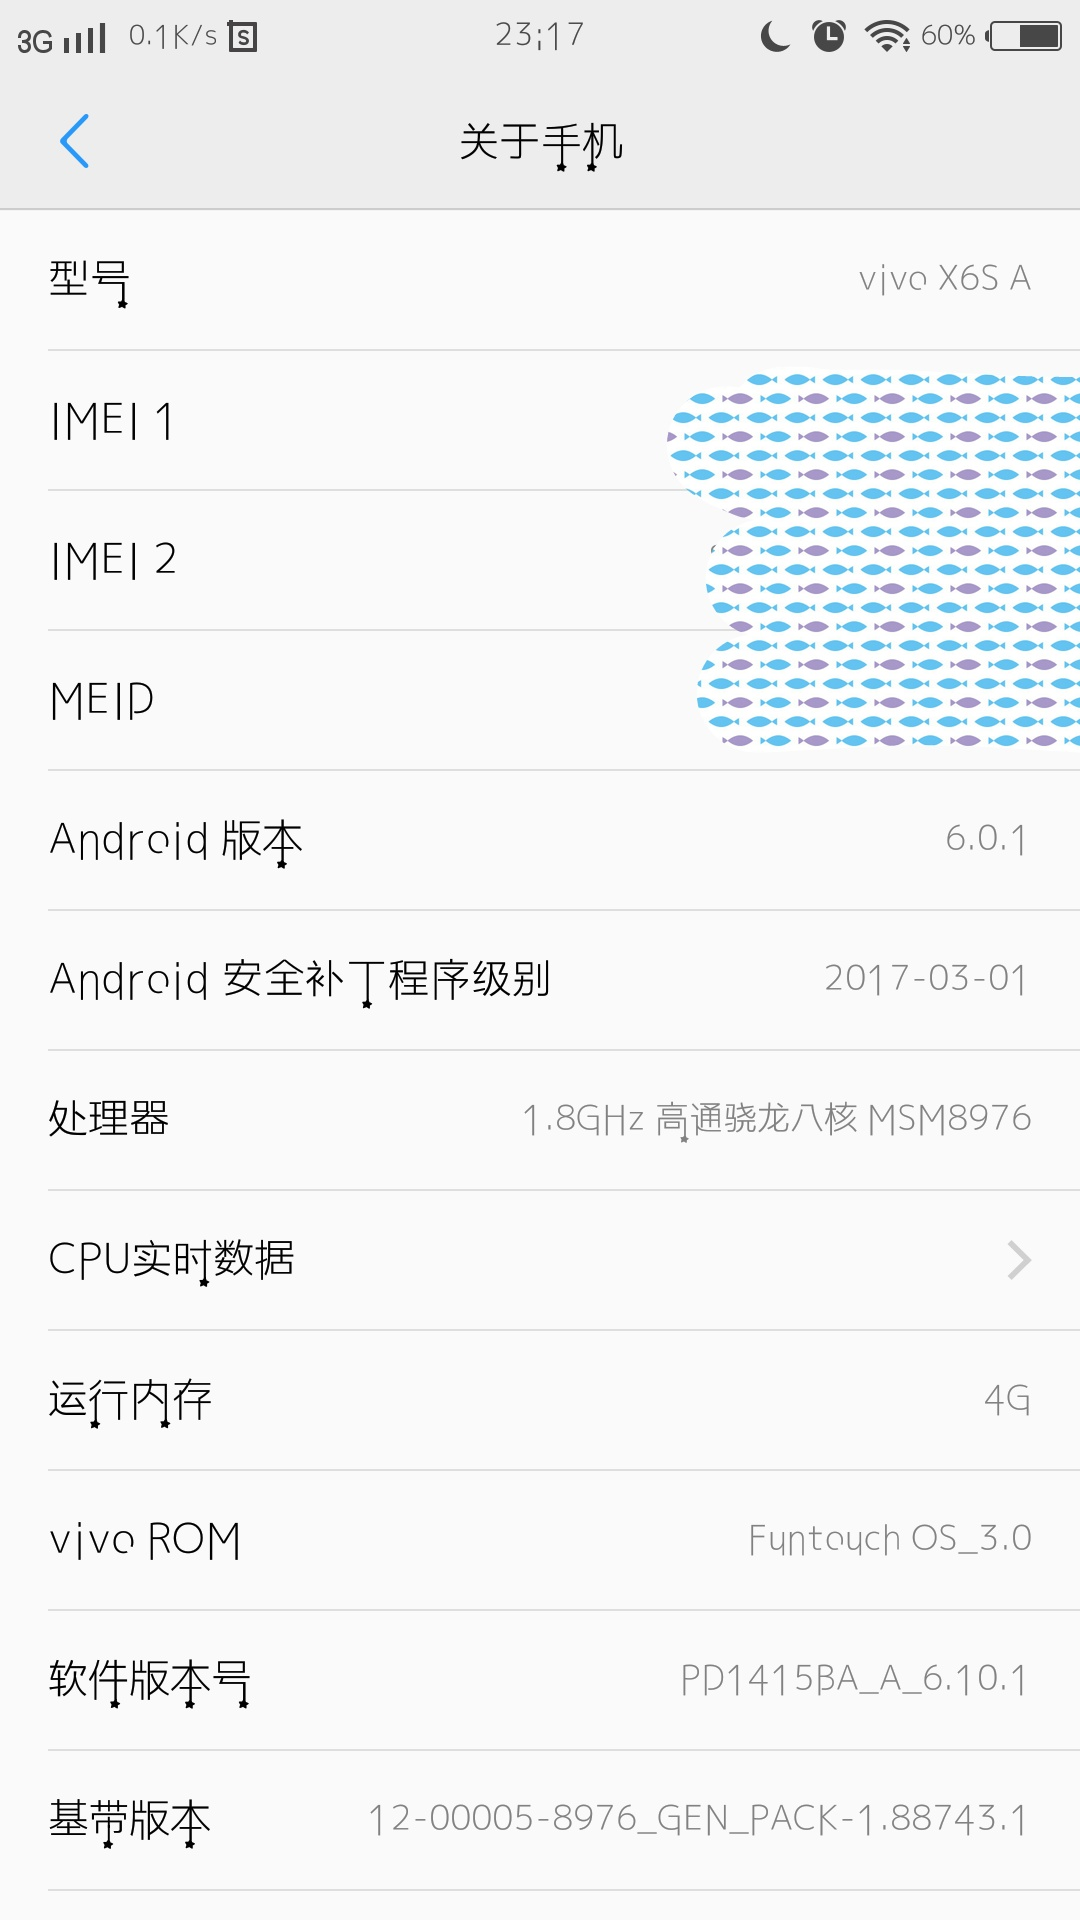 IMG_20170728_125000.JPG